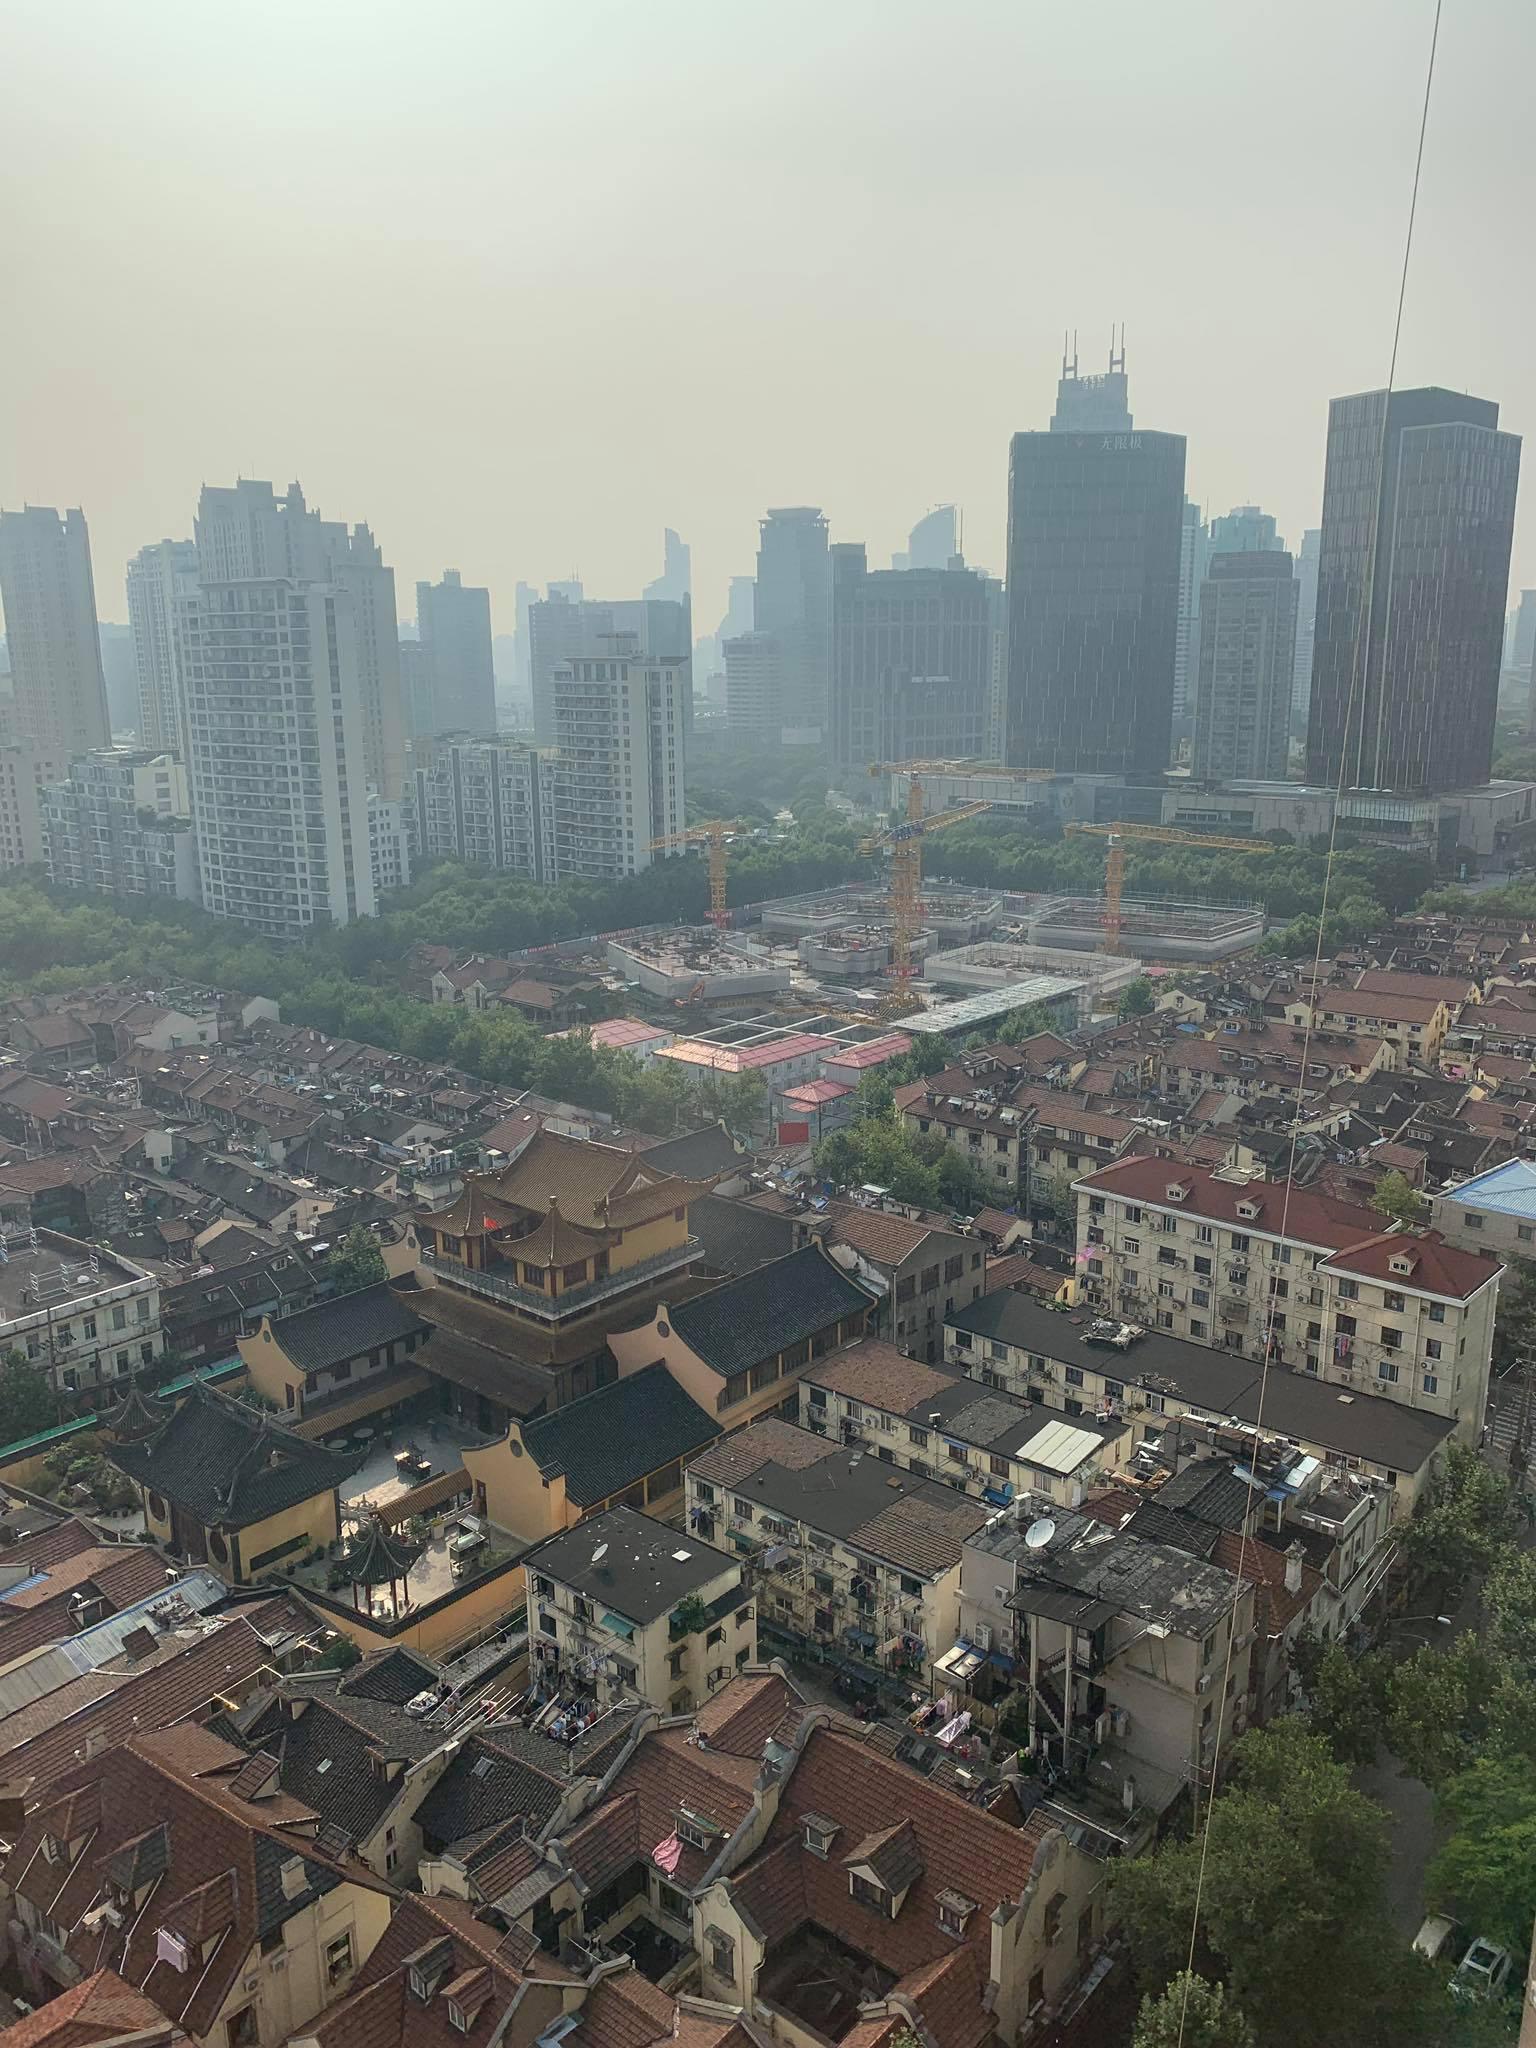 Day 5: Xi'an to Shanghai / China